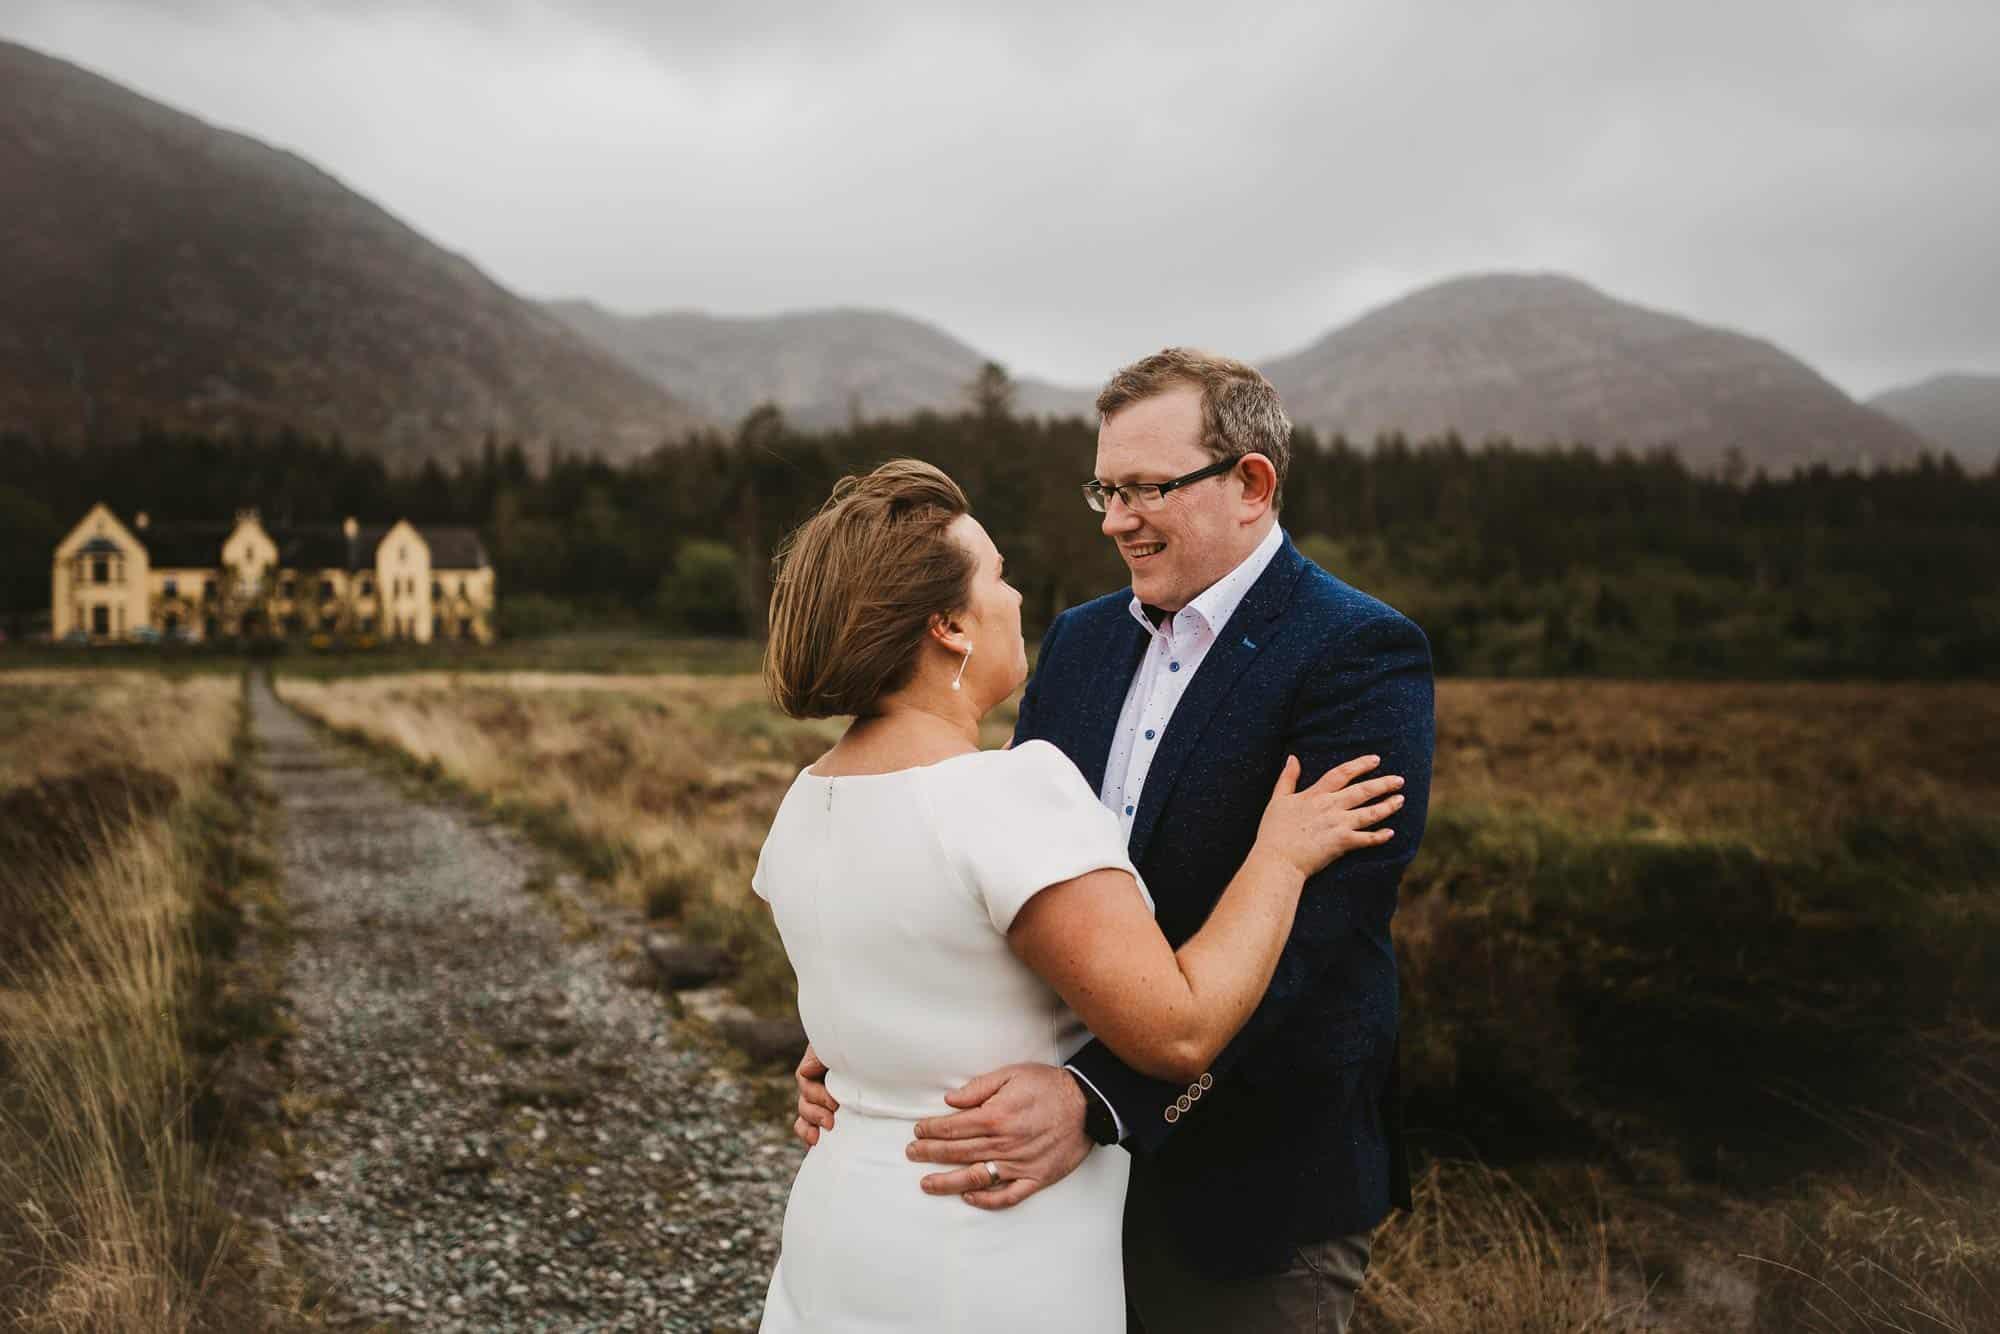 Planning for Elopements in Ireland Adventure Couple